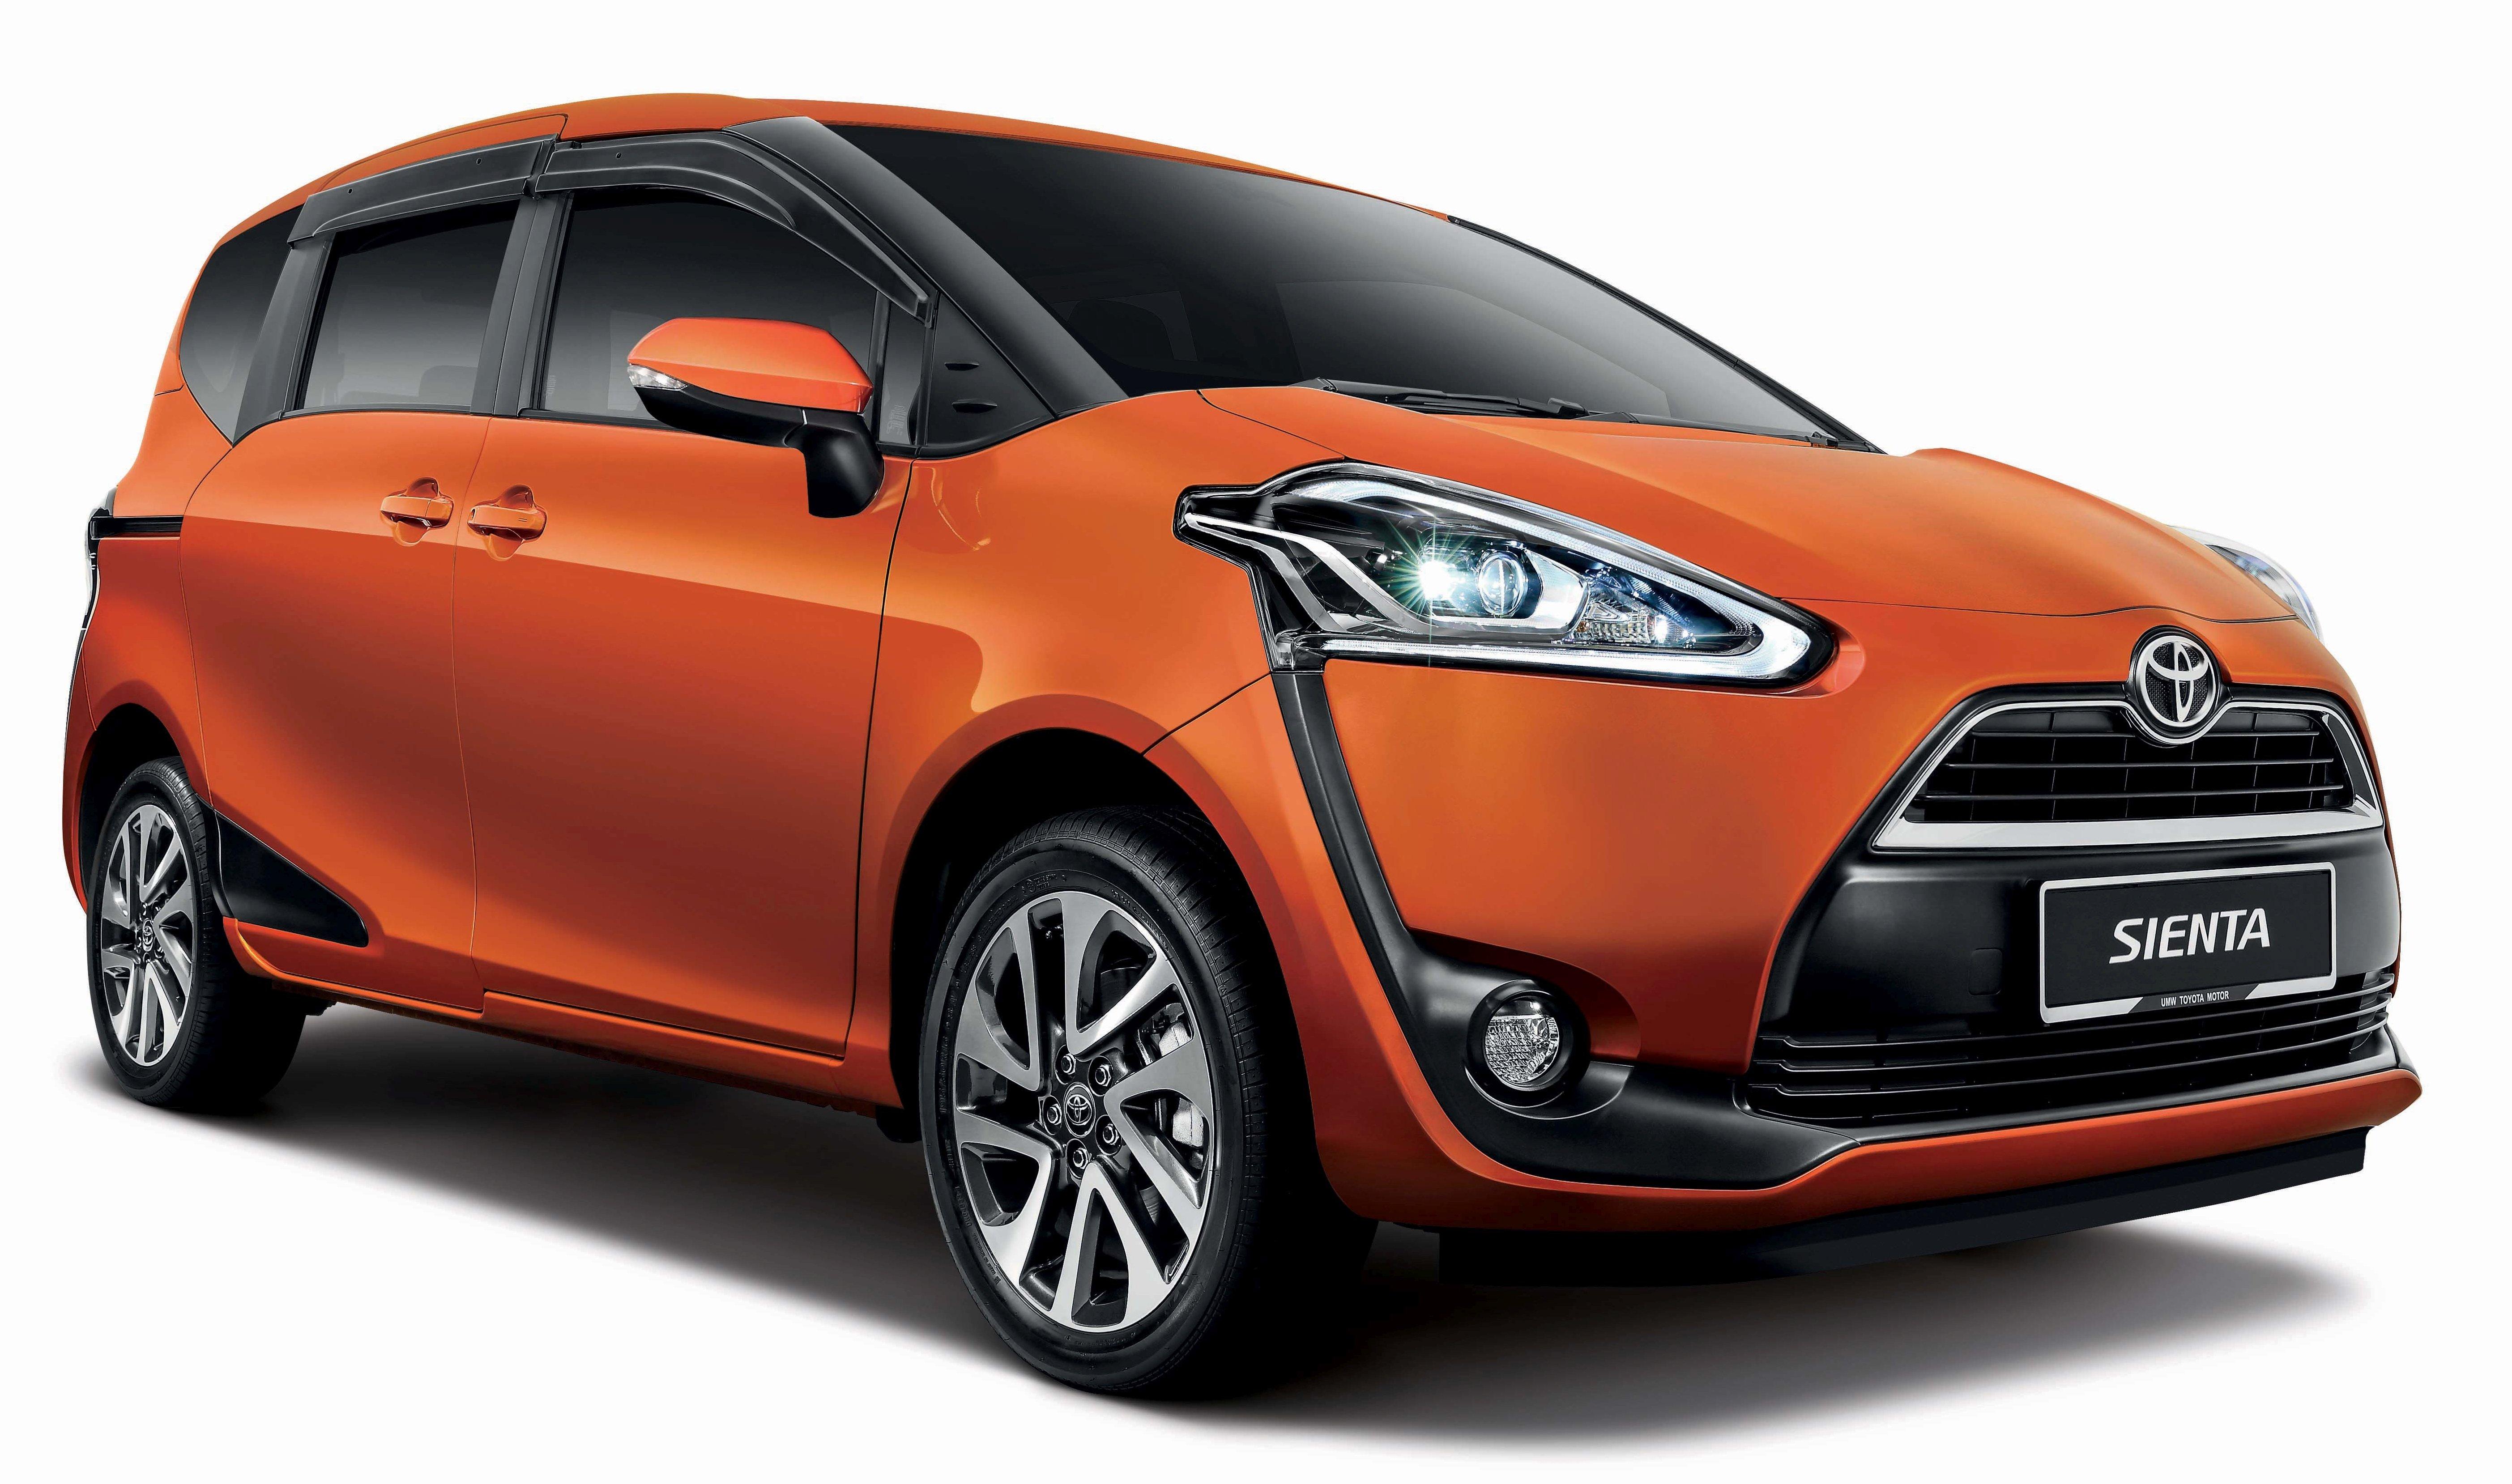 Kekurangan Harga Toyota Sienta 2019 Tangguh